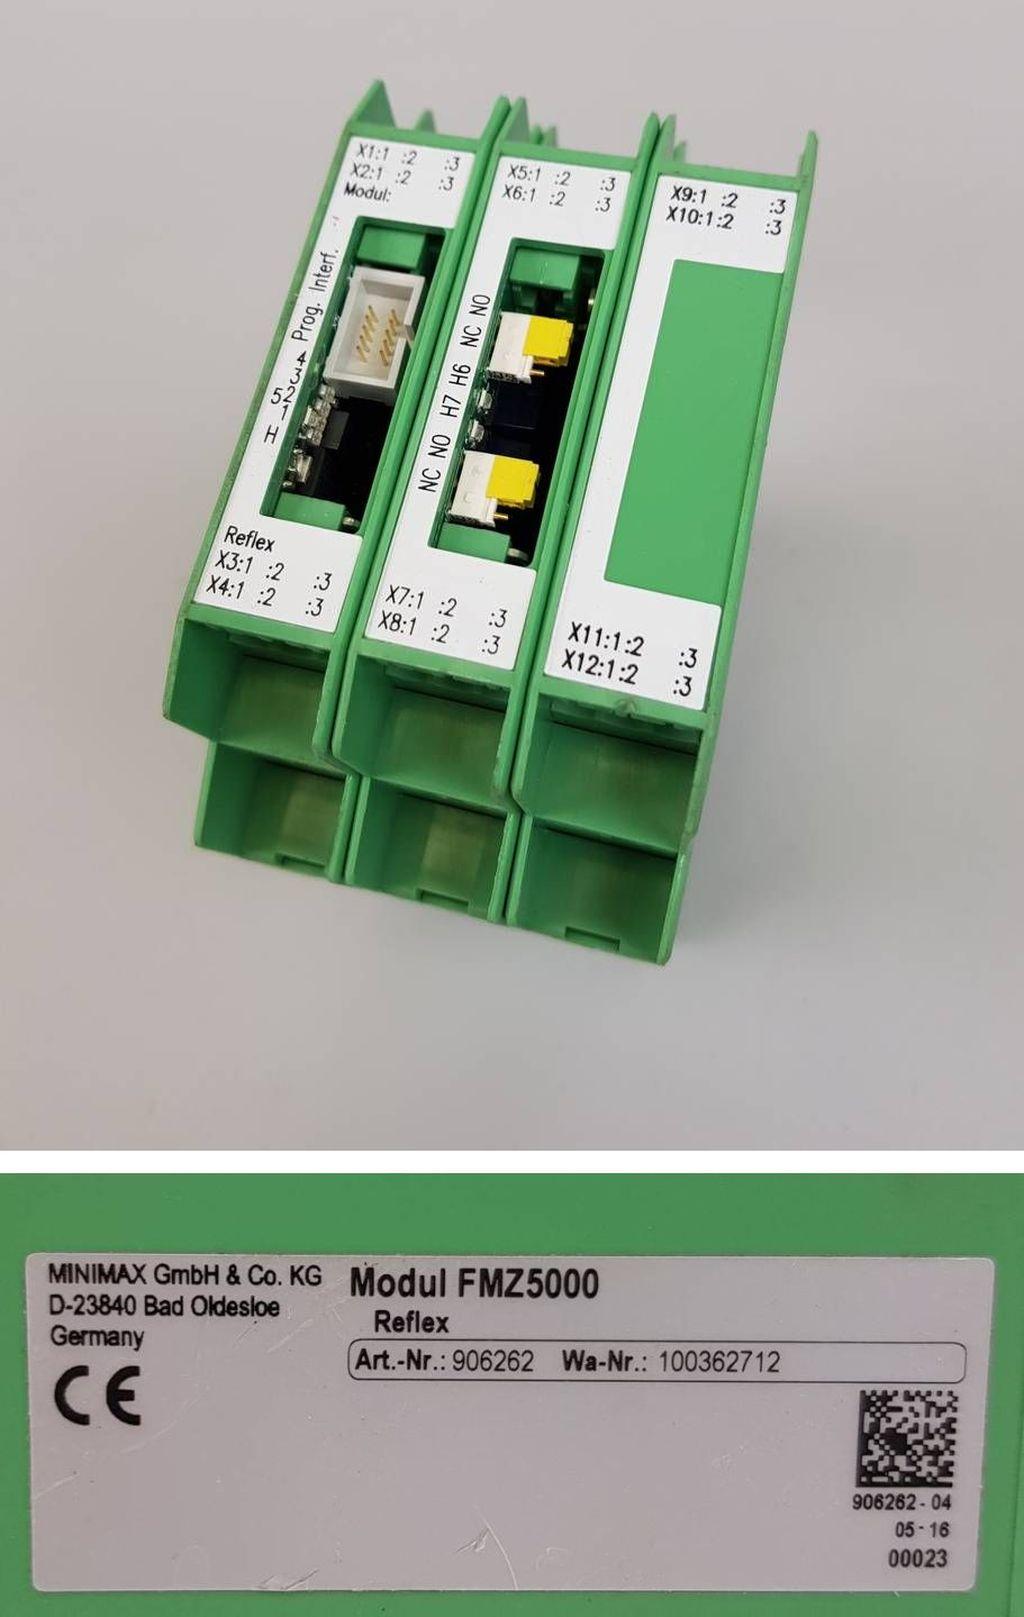 Umreifungsband PP 12,0x 0,45mm Länge 1000meter in Spenderbox Möbel Reifen